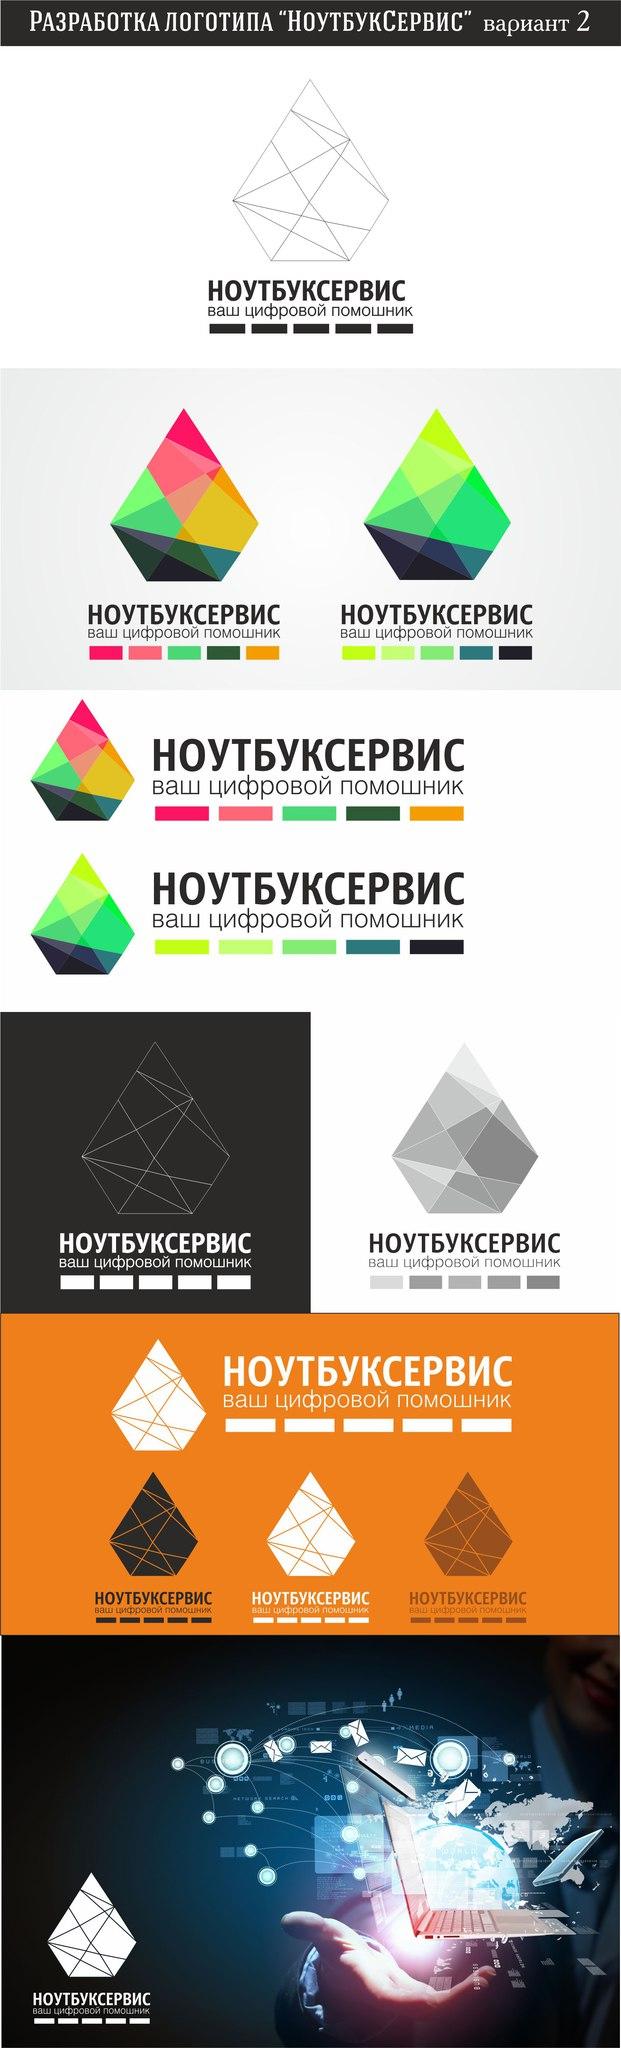 Разработка логотипа Ноутбук Сервис